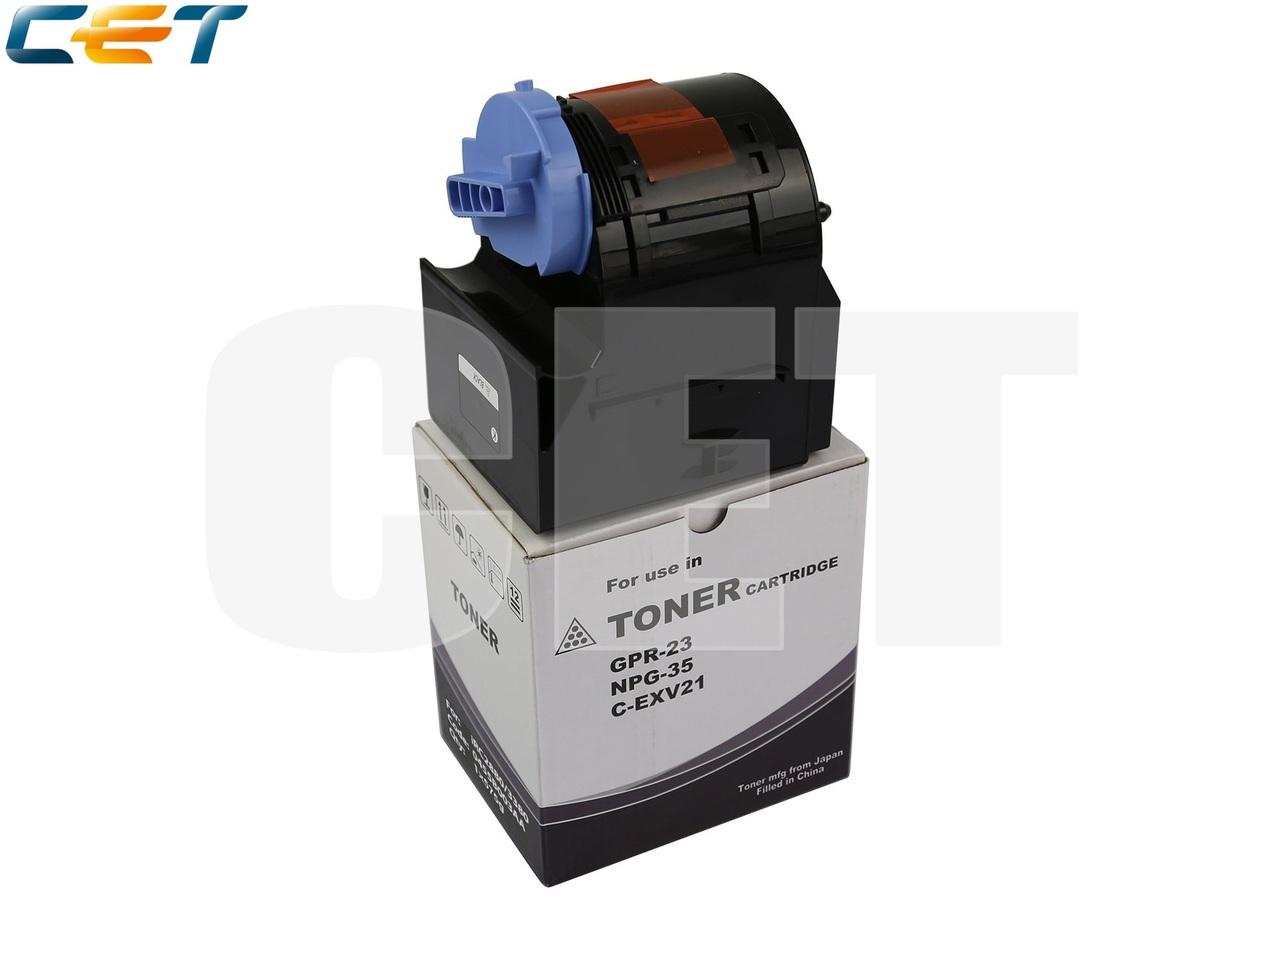 Тонер-картридж C-EXV21 для CANON iRC2880/C3380 (CET)Black, 575г, 26000 стр., CET6568